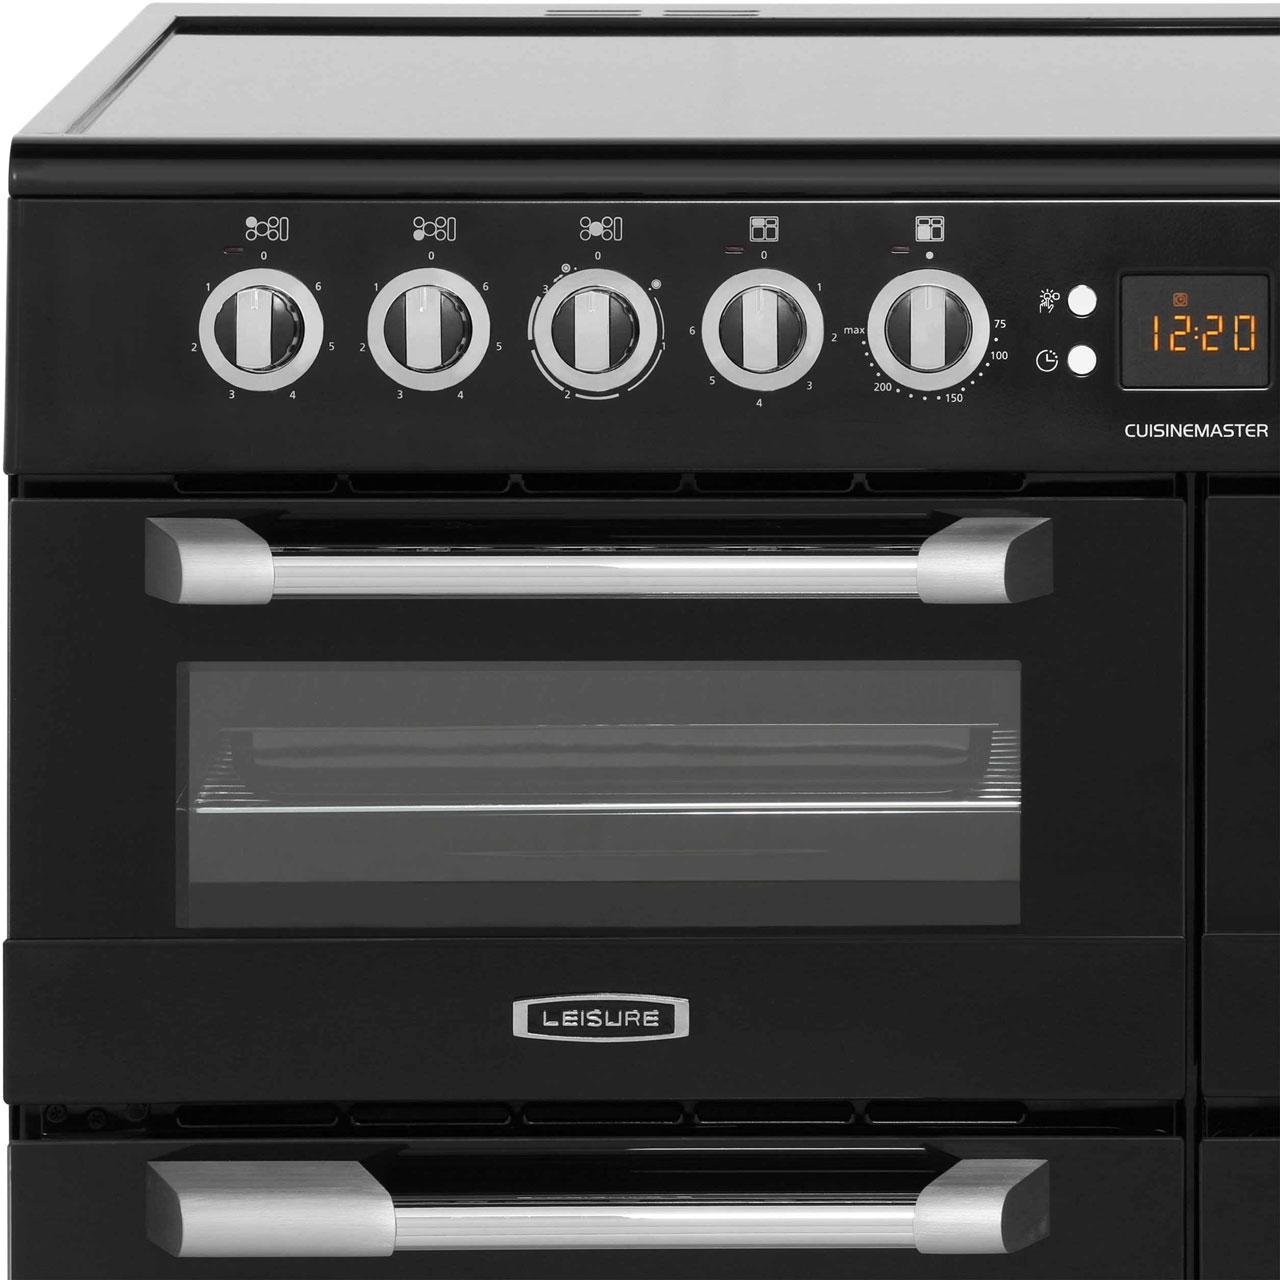 Leisure Cuisinemaster Cs100c510x Electric Range Cooker